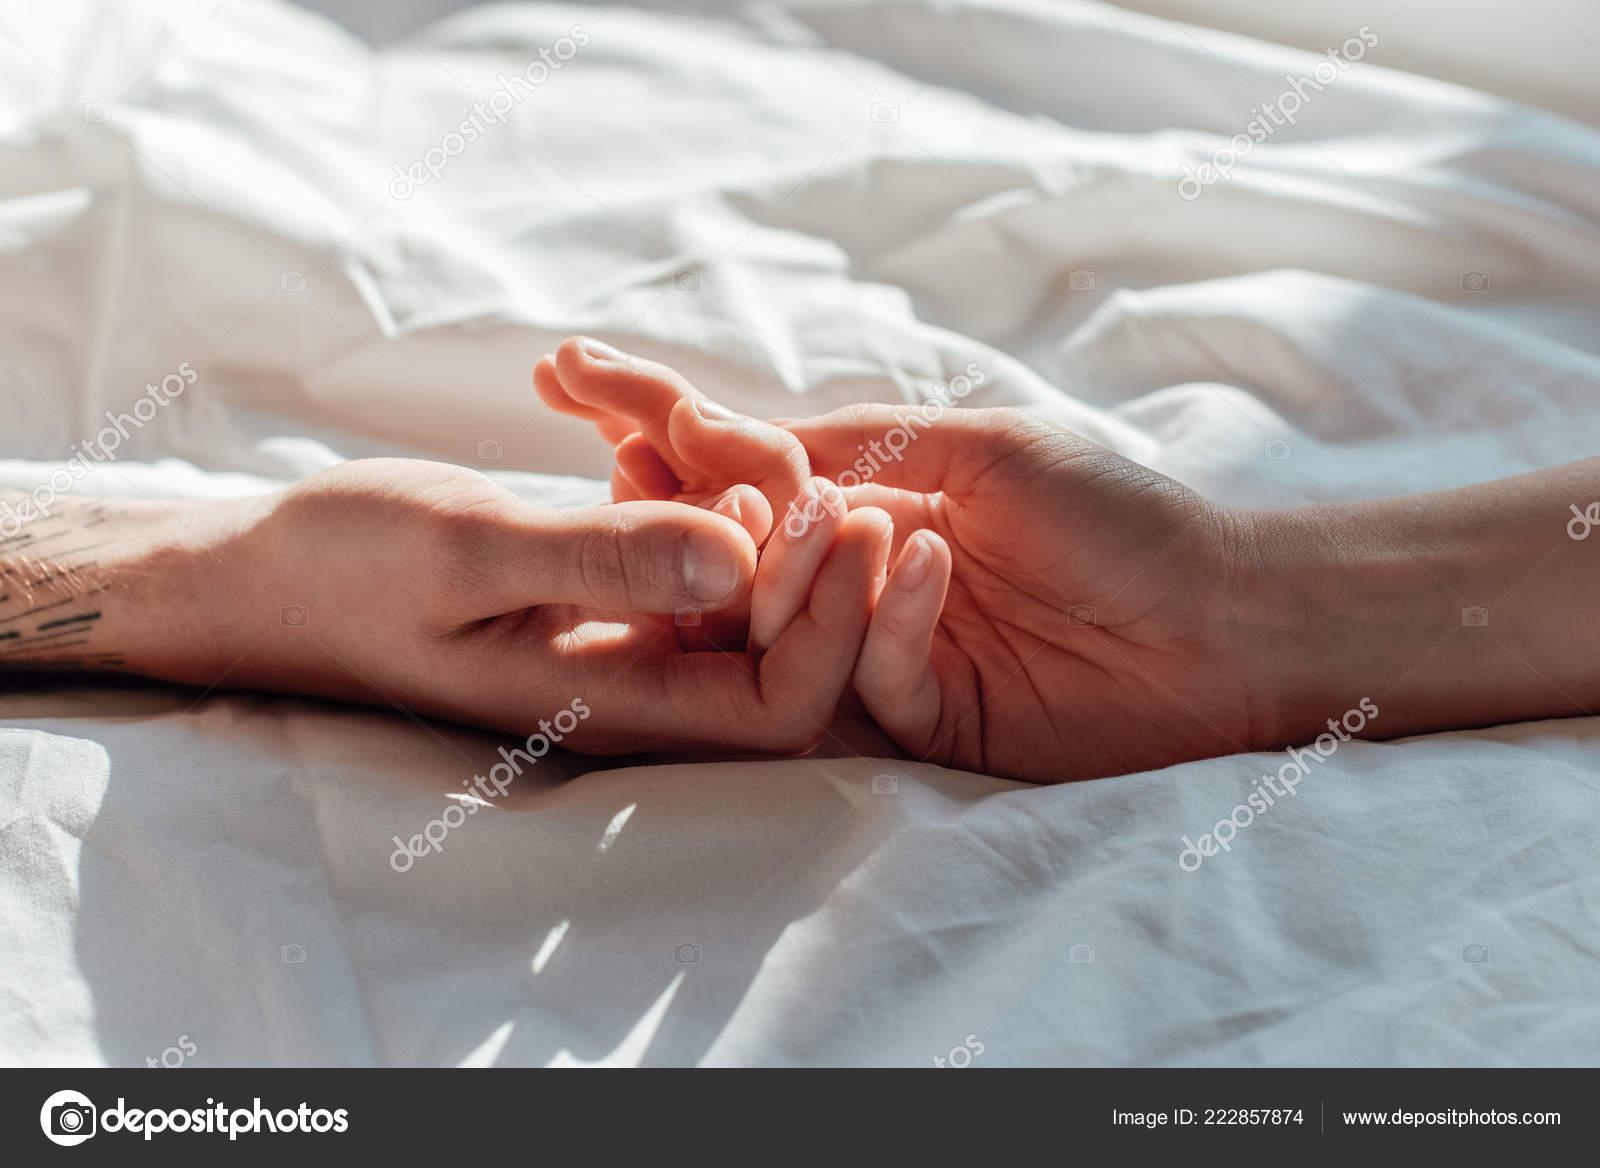 ciftin birlikte yatakta yatarken canli tutarak hads kismi gorunumu 222857874